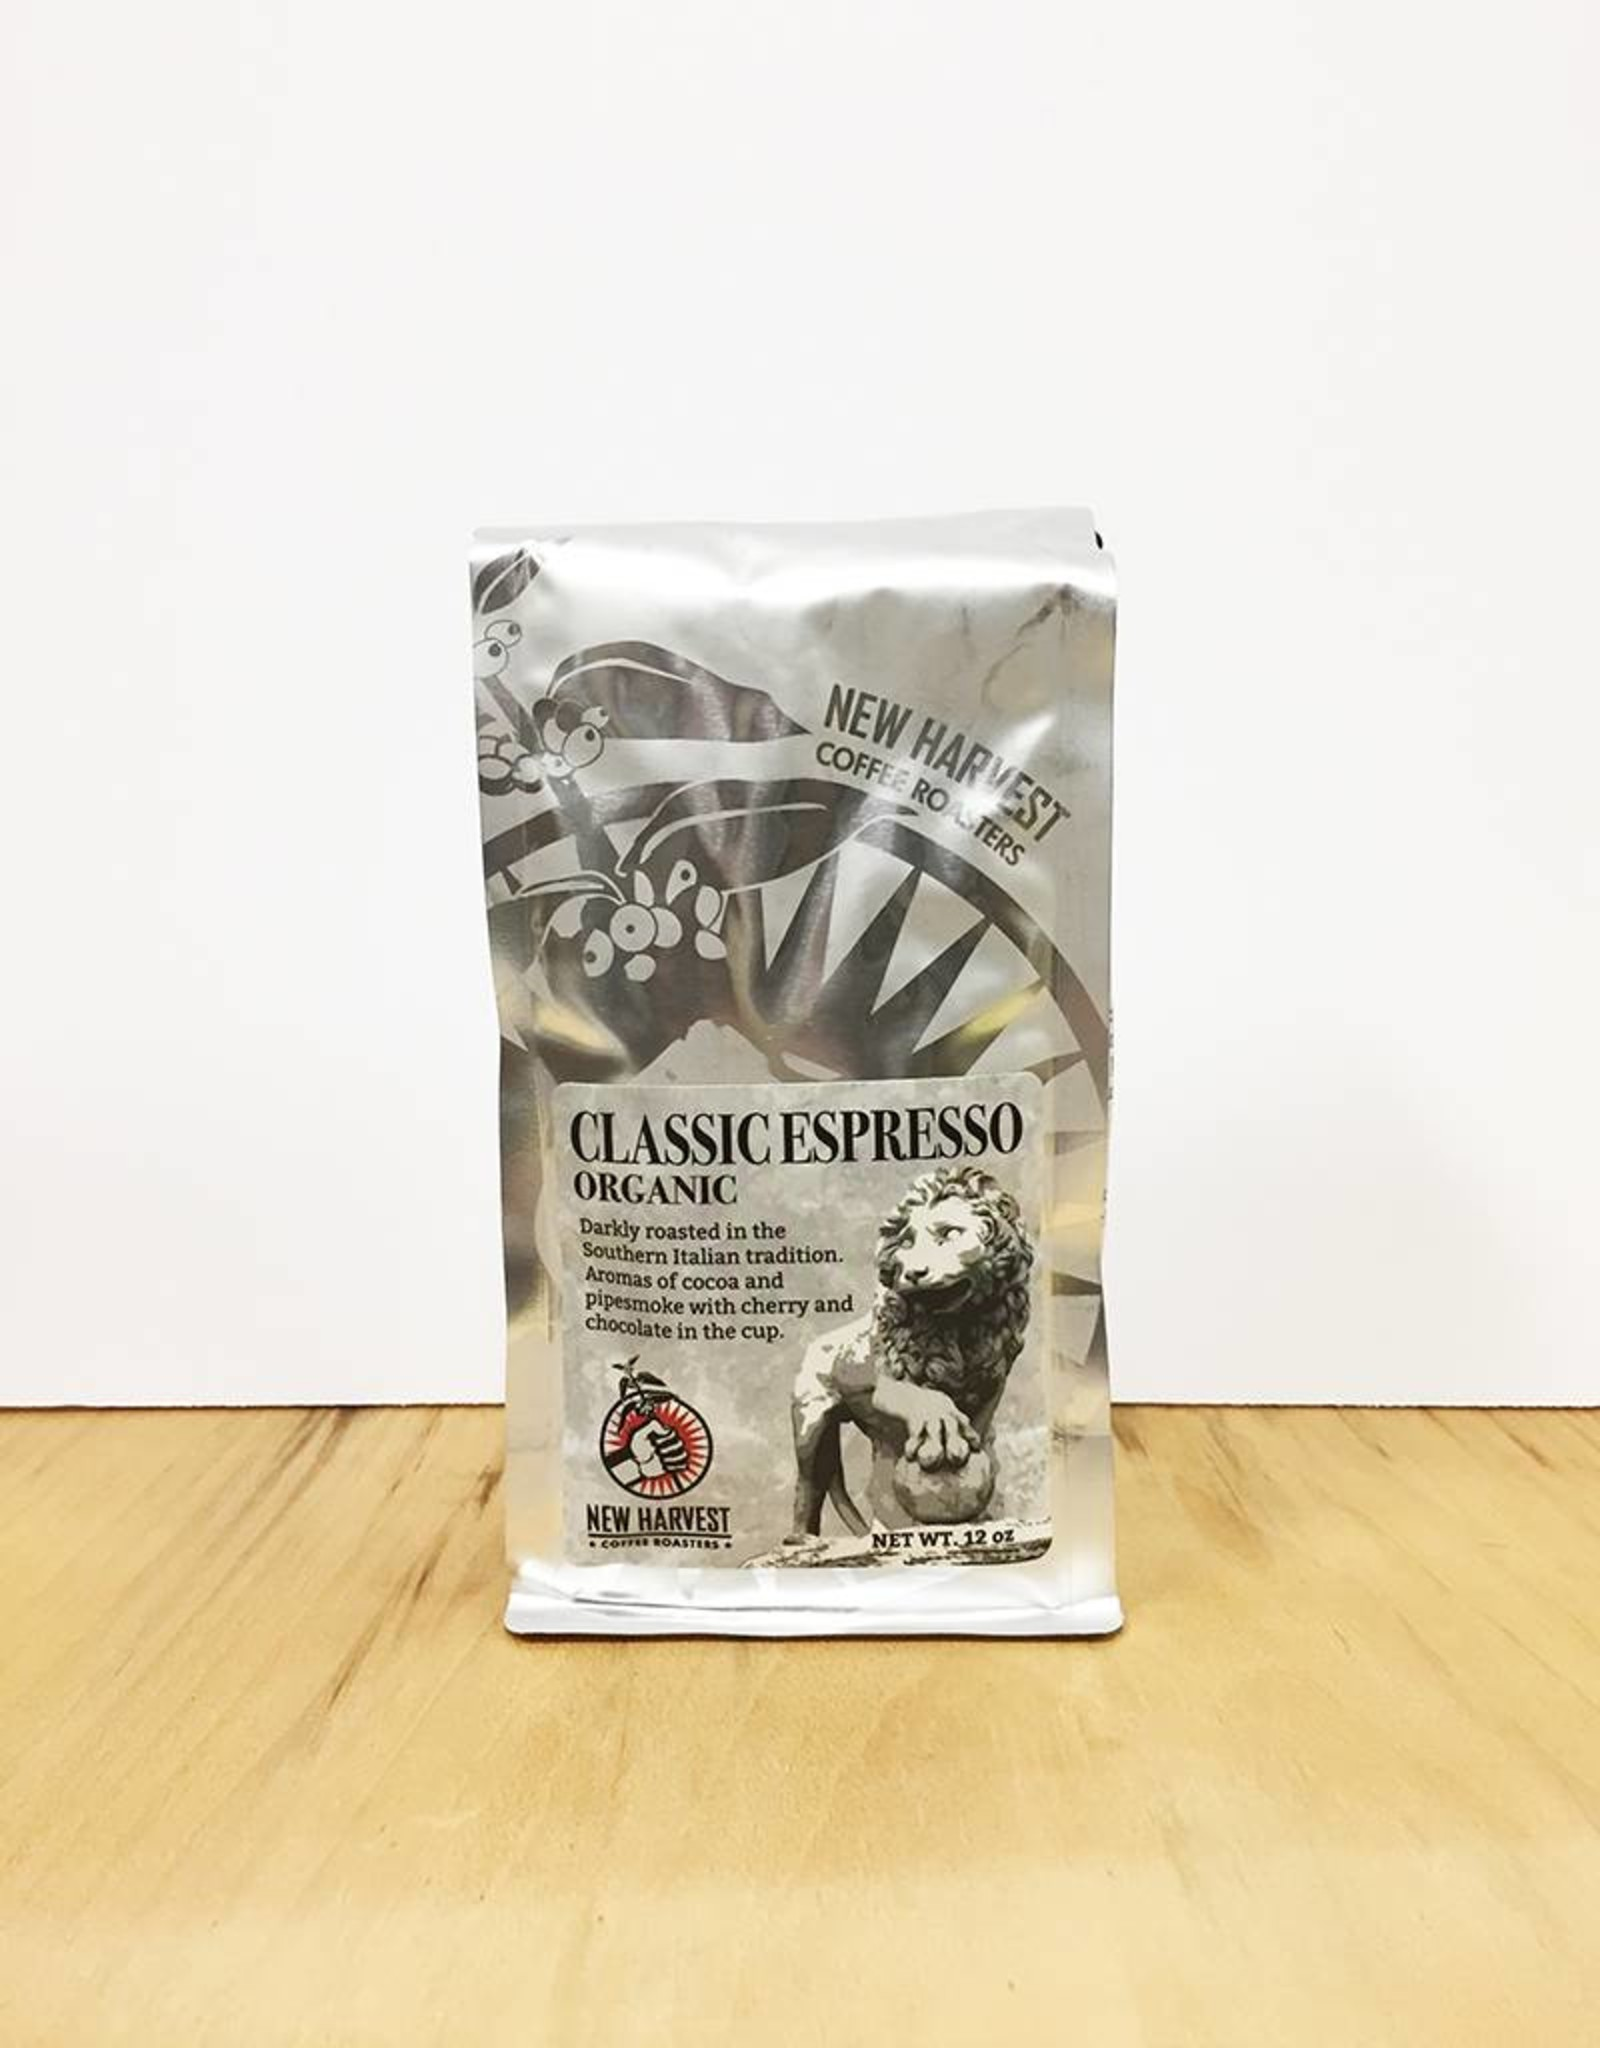 New Harvest New Harvest Organic Coffee (Classic Espresso)